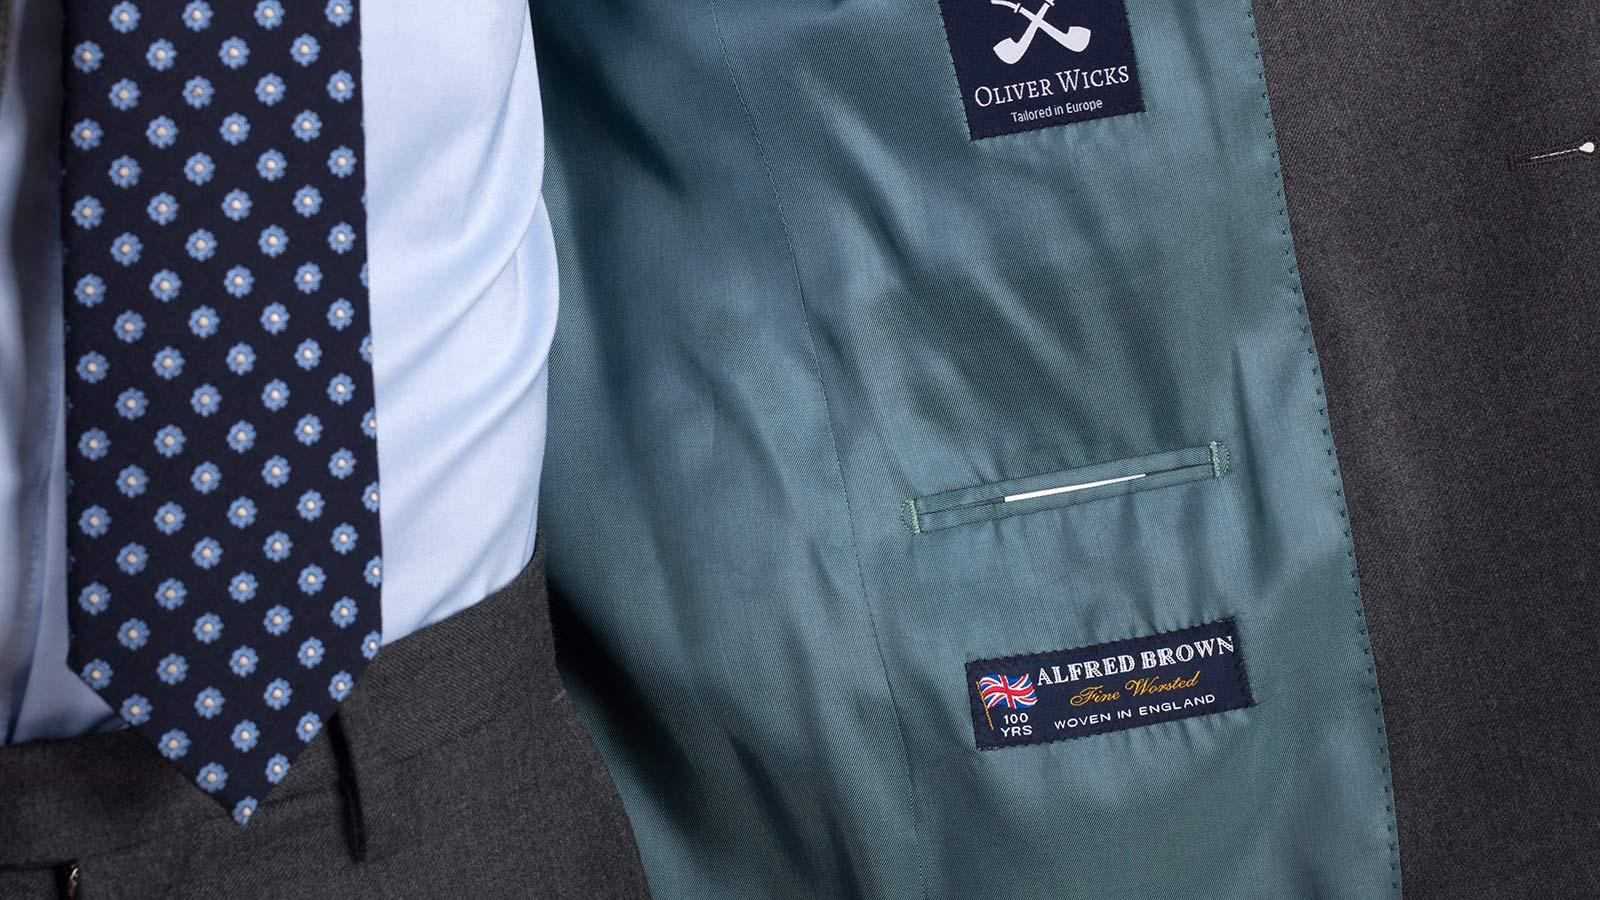 11 oz Grey Twill Suit - slider image 1